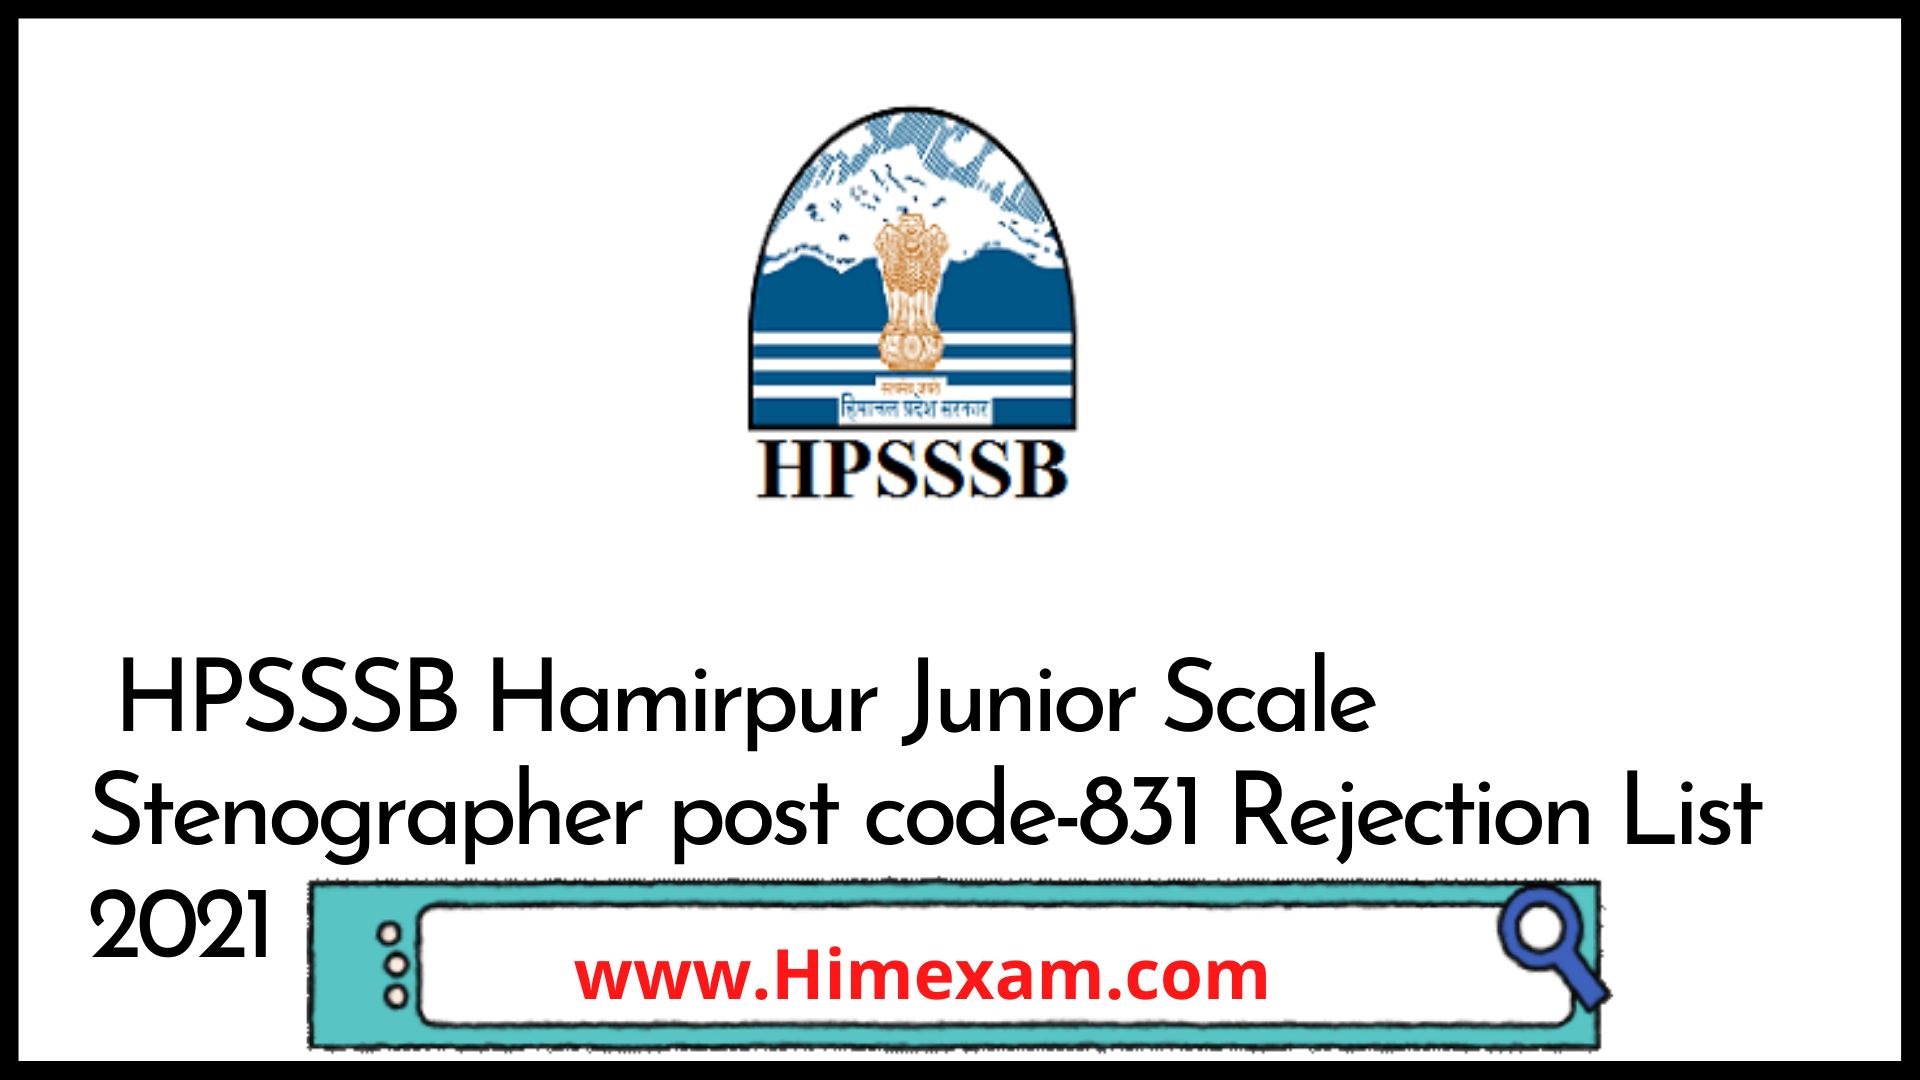 HPSSSB Hamirpur Junior Scale Stenographer post code-831 Rejection List 2021